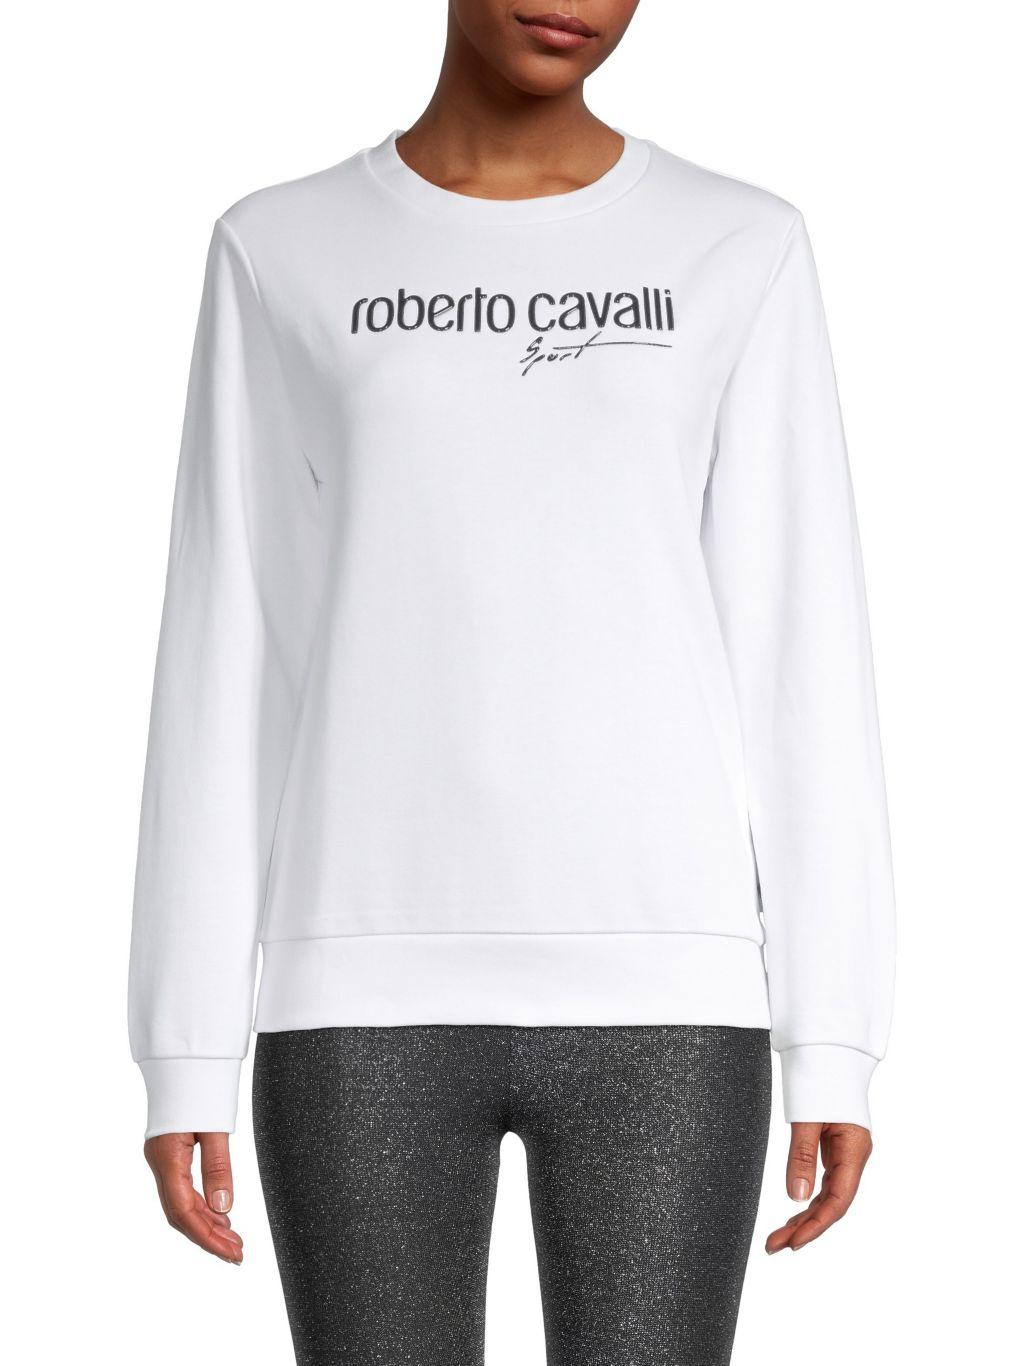 Roberto cavalli SPORT Logo Sweatshirt